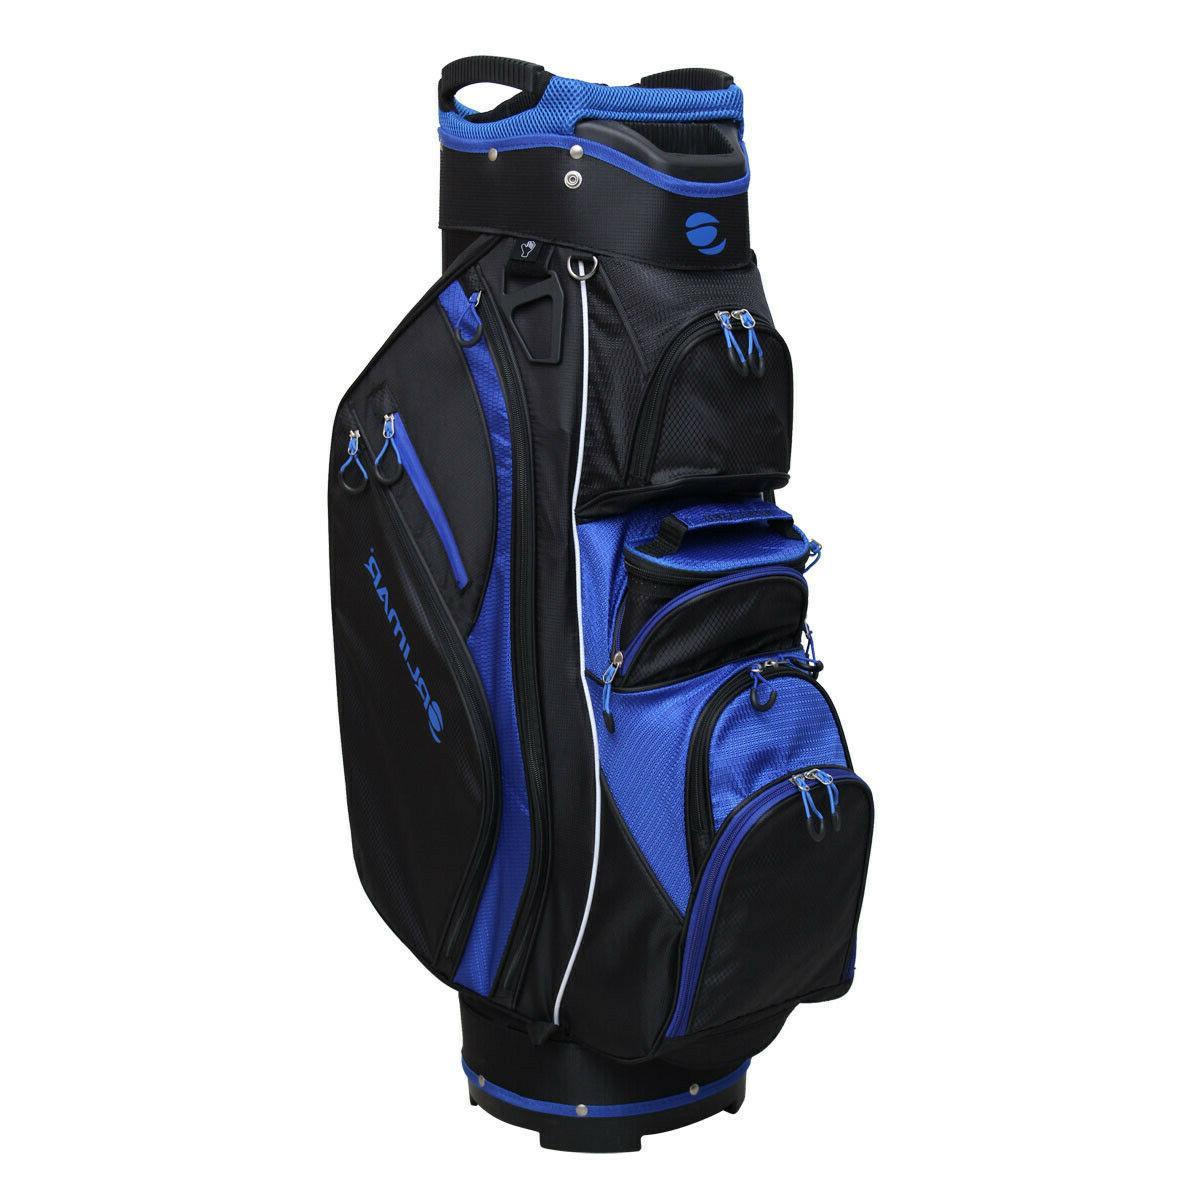 golf crx cooler cart bag black blue